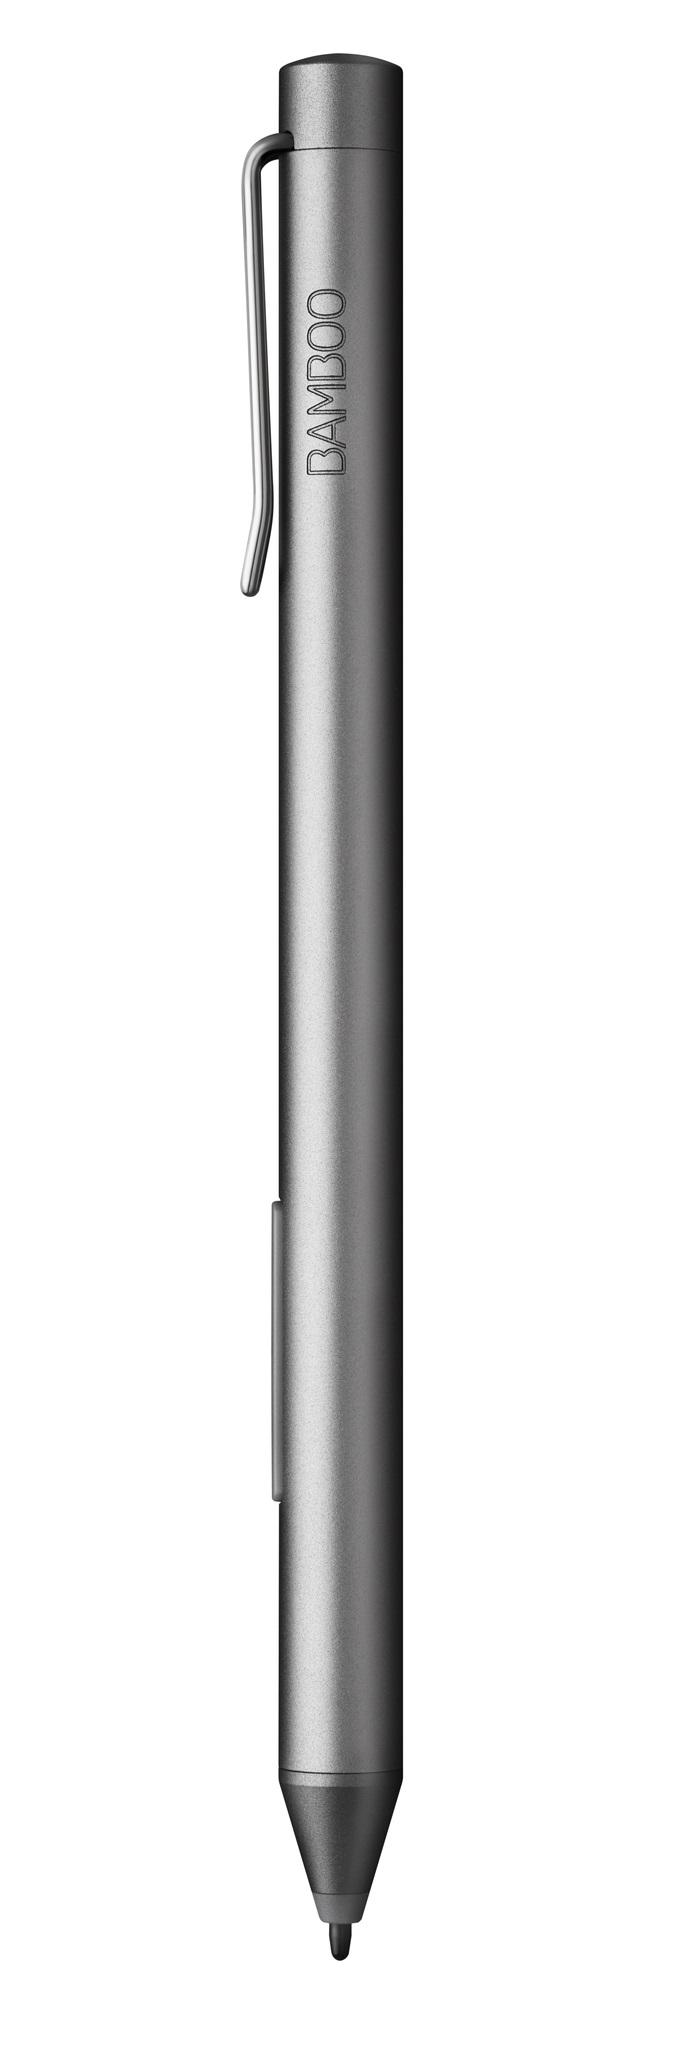 Wacom Bamboo Ink, 2nd, Gray, stylus - CS323AG0B